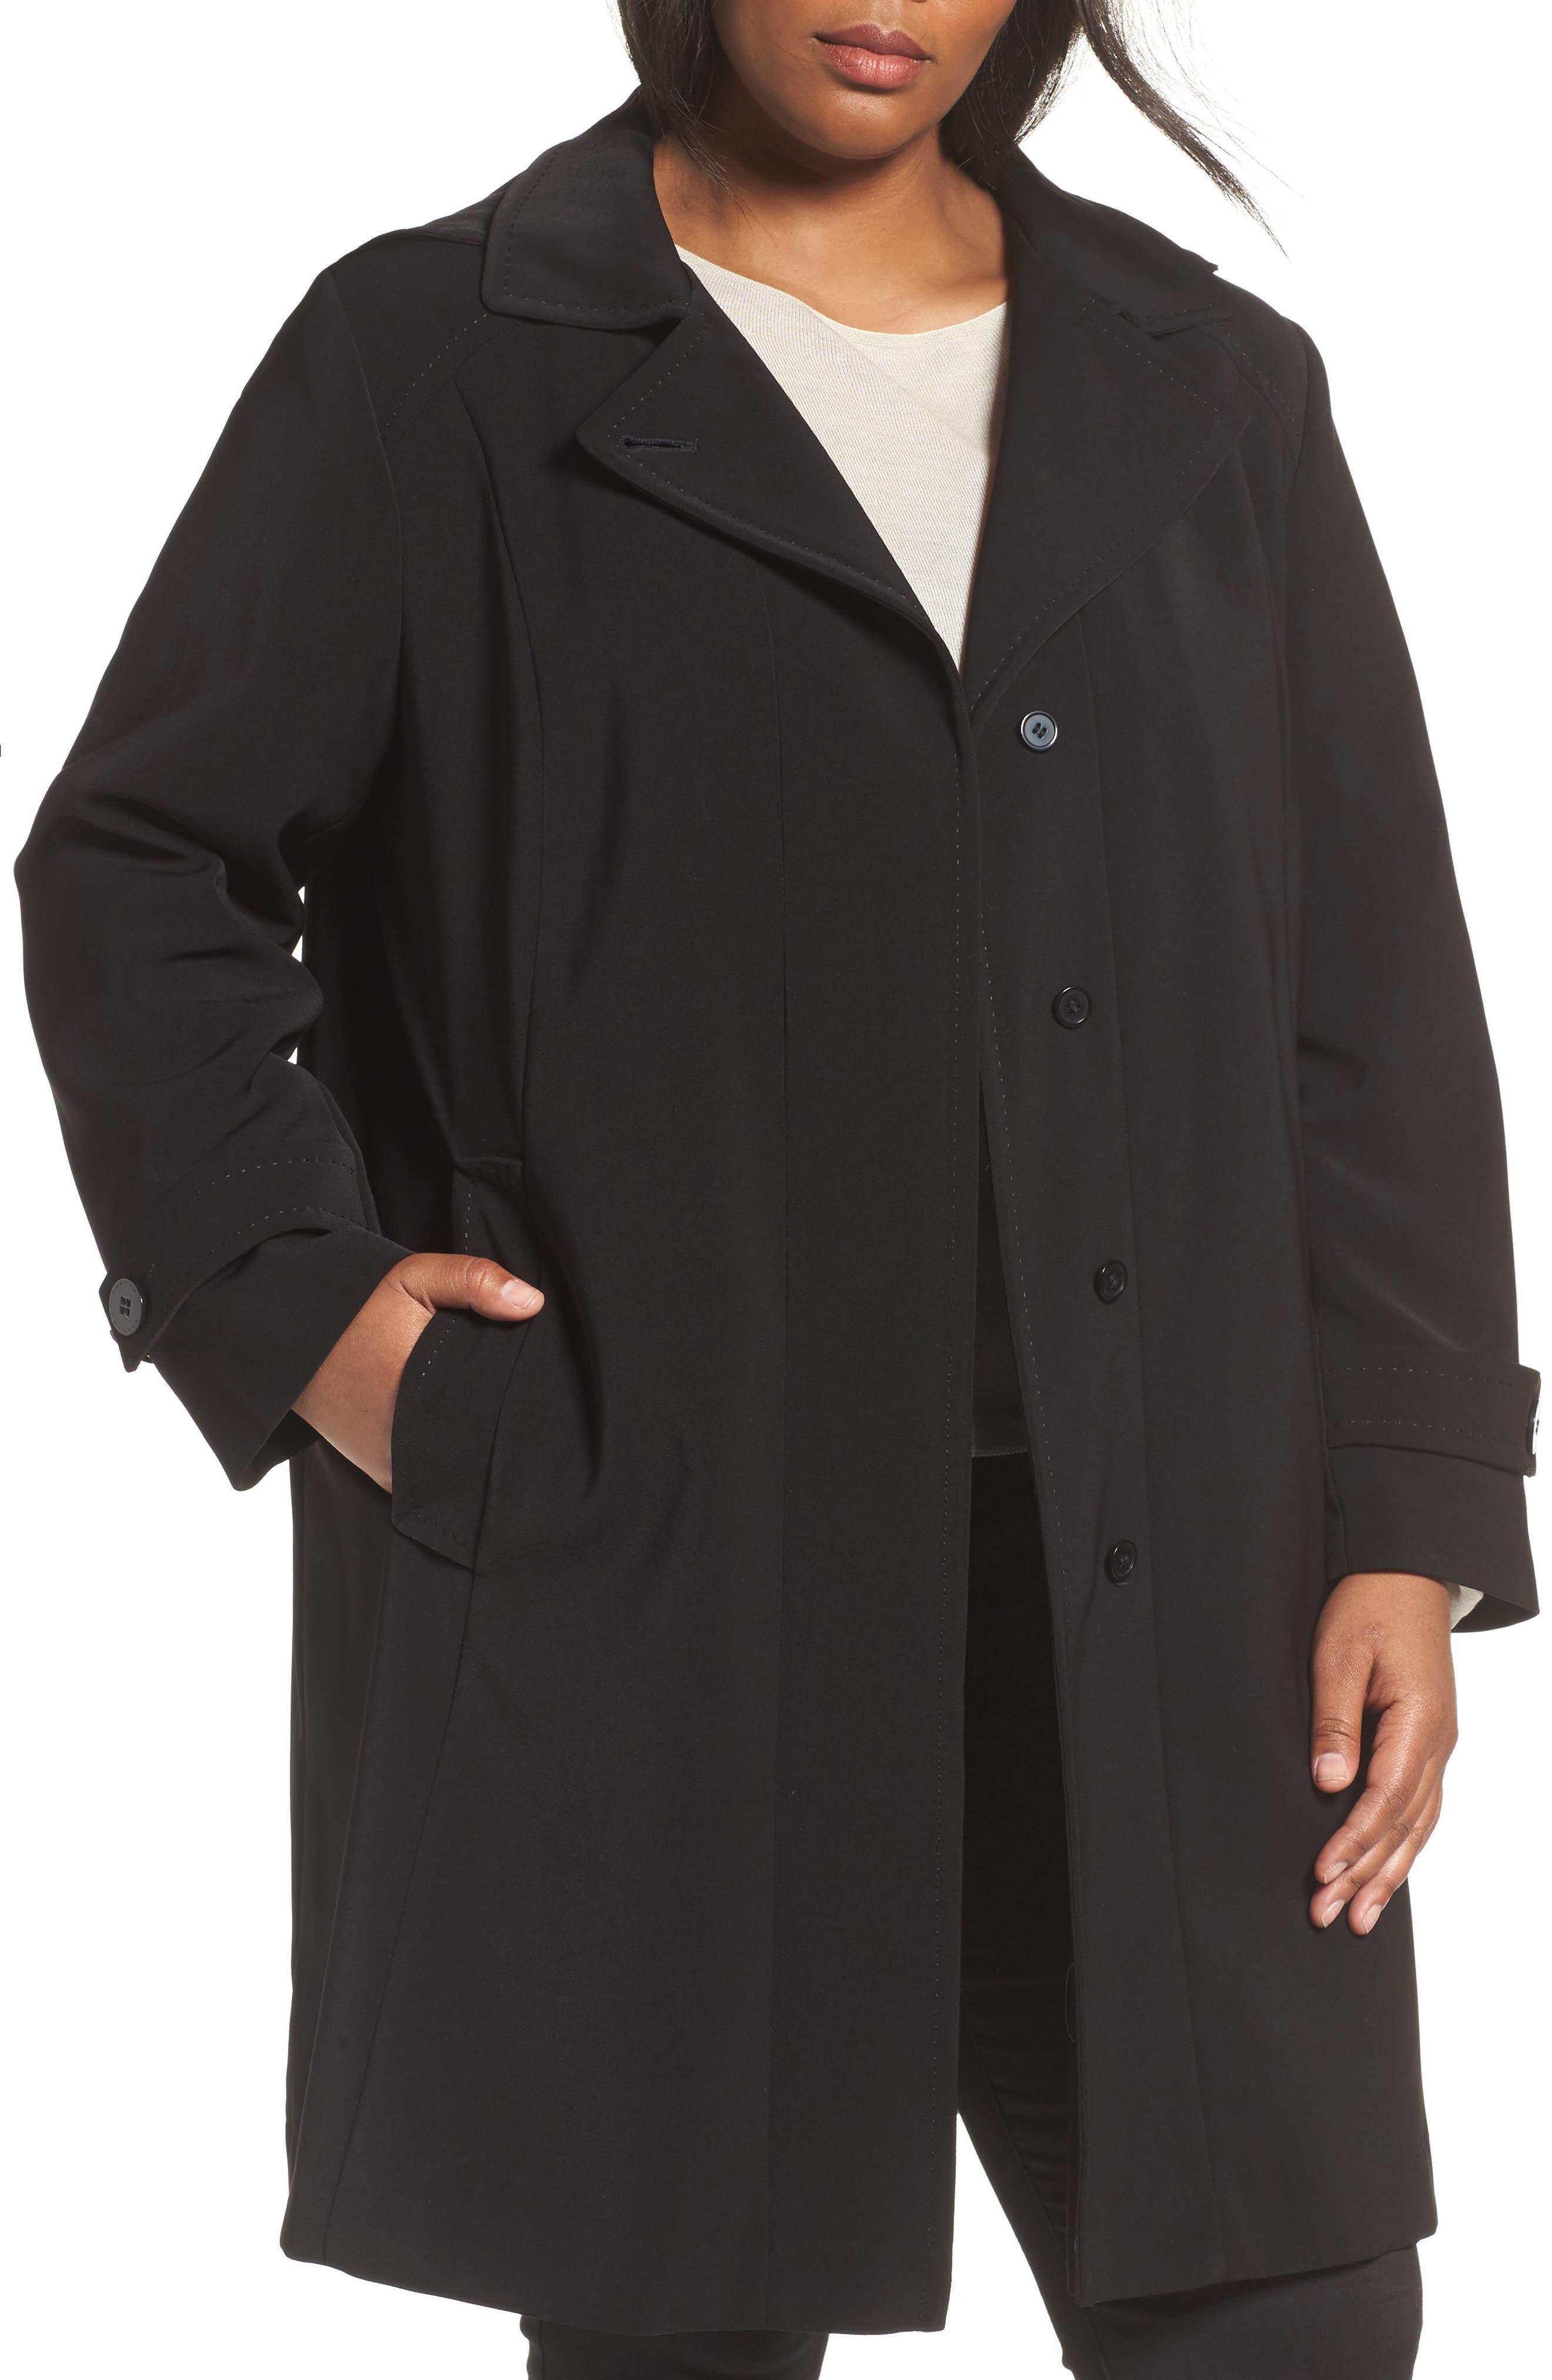 A-Line Raincoat with Detachable Hood & Liner,                         Main,                         color, Black